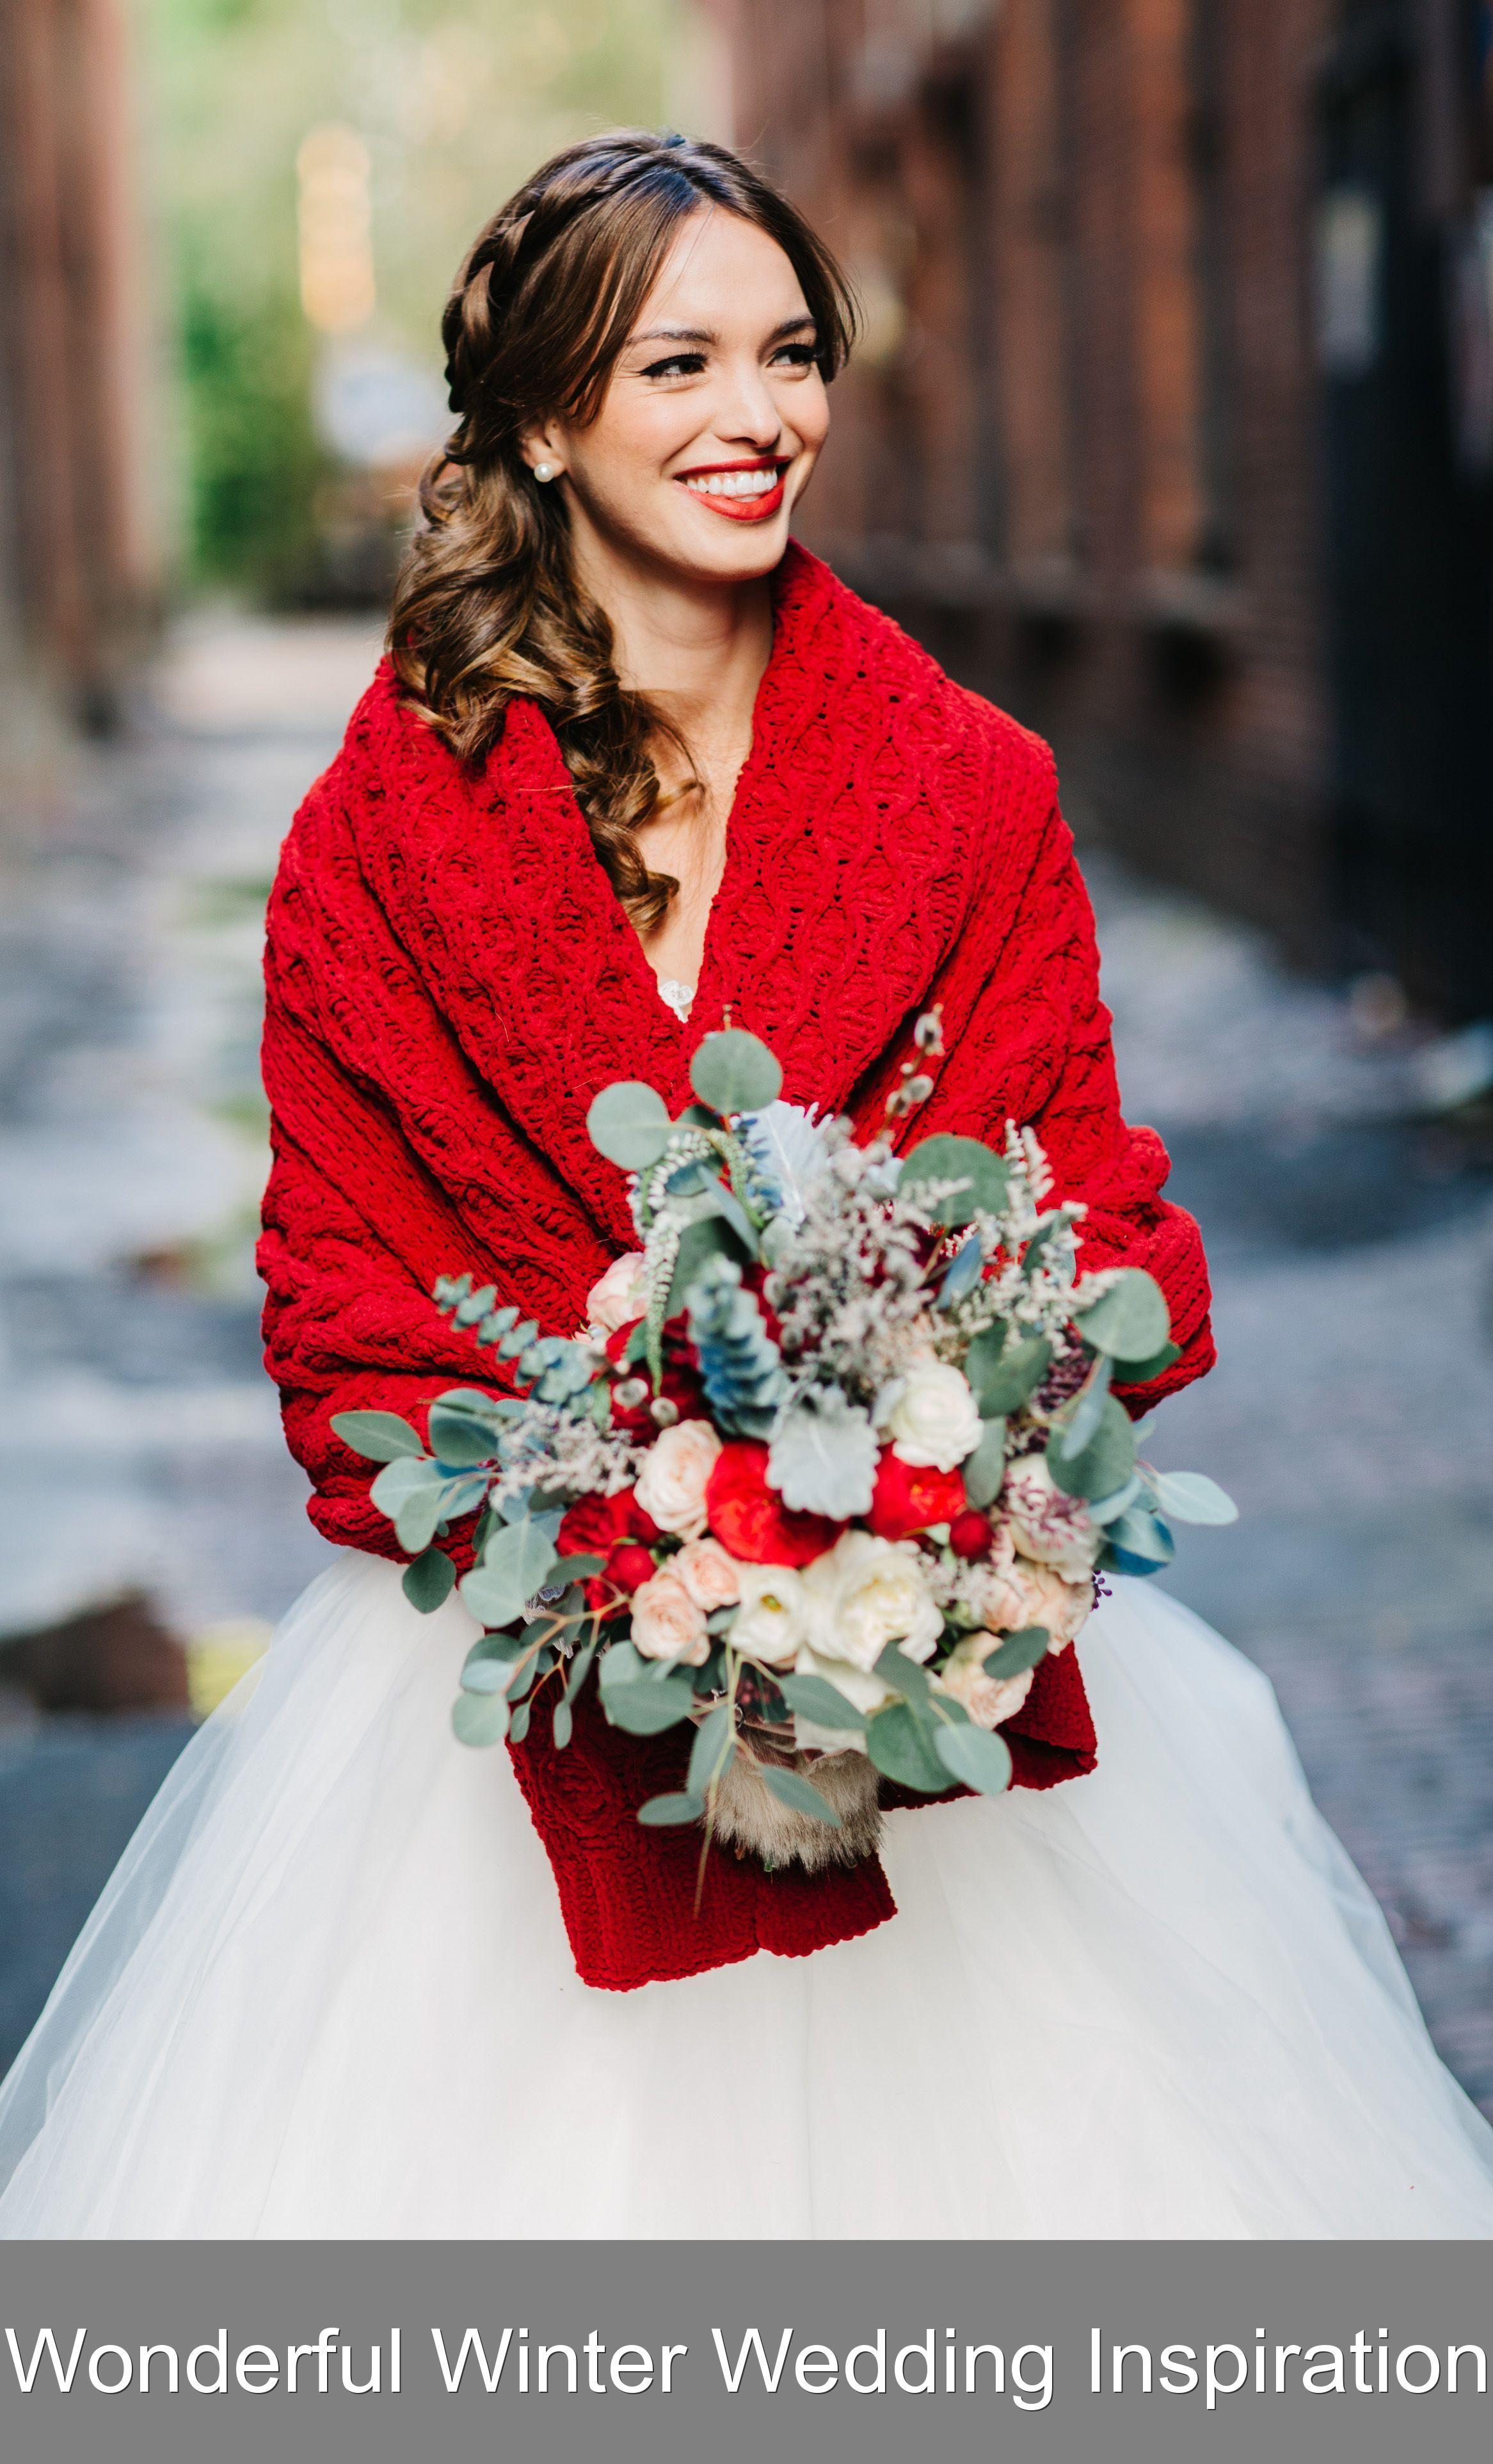 Wonderful Winter Wedding Inspiration This Gorgeous Shoot Is All About The Beautiful Joys Of The Winter Season Prepare Your 2020 Gelinler Kis Dugunleri Elbise Dugun